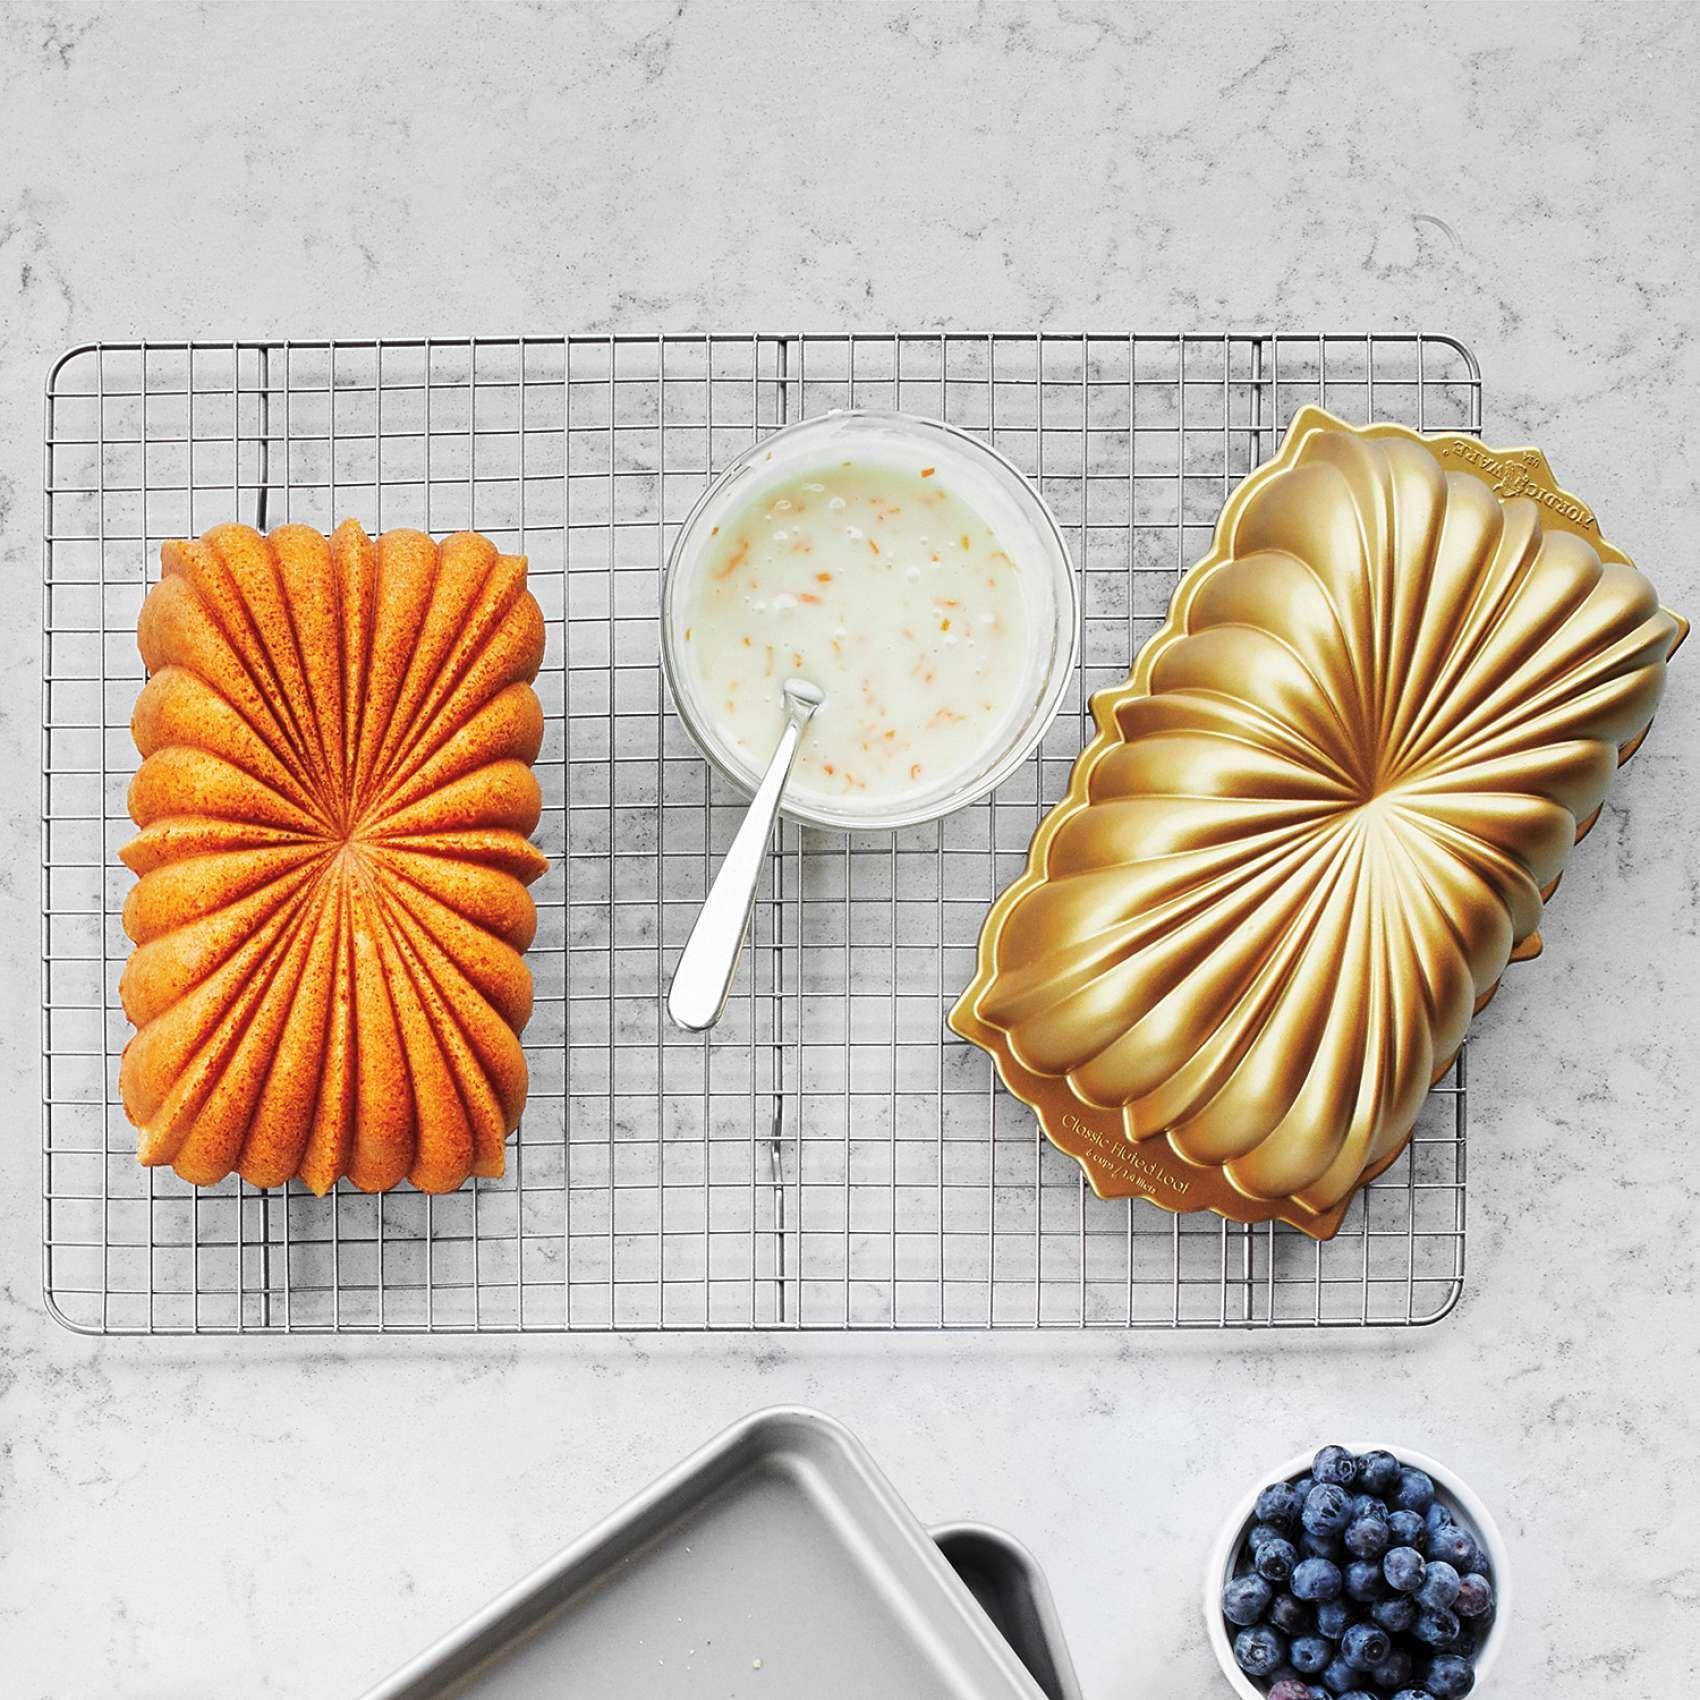 Nordic ware anniversary loaf pan 6 cups sur la table